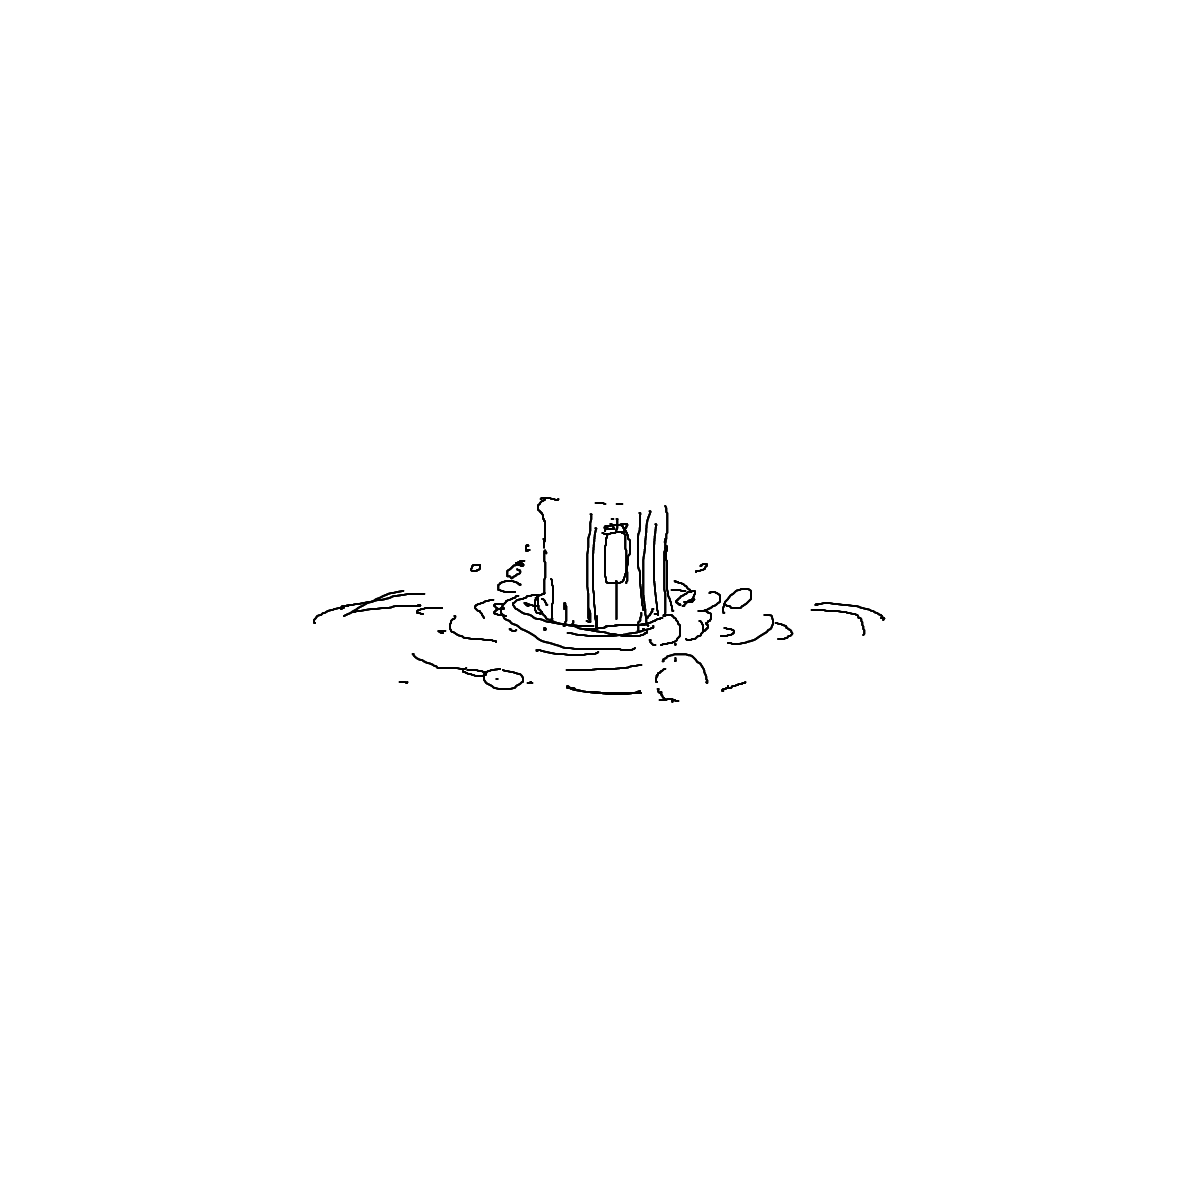 BAAAM drawing#8671 lat:78.4203567504882800lng: -4.4845623970031740